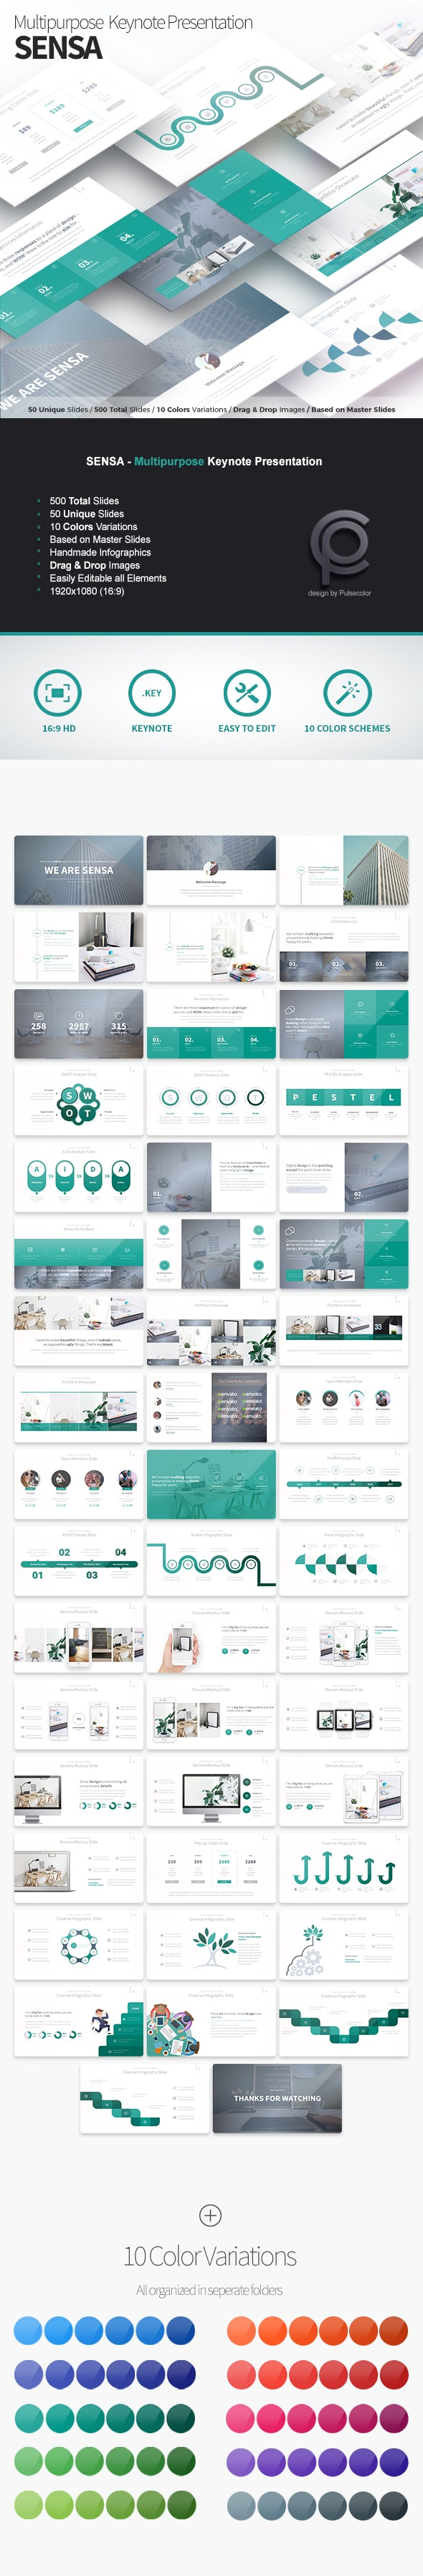 Sensa - Multipurpose Keynote Presentation - Business Keynote Templates